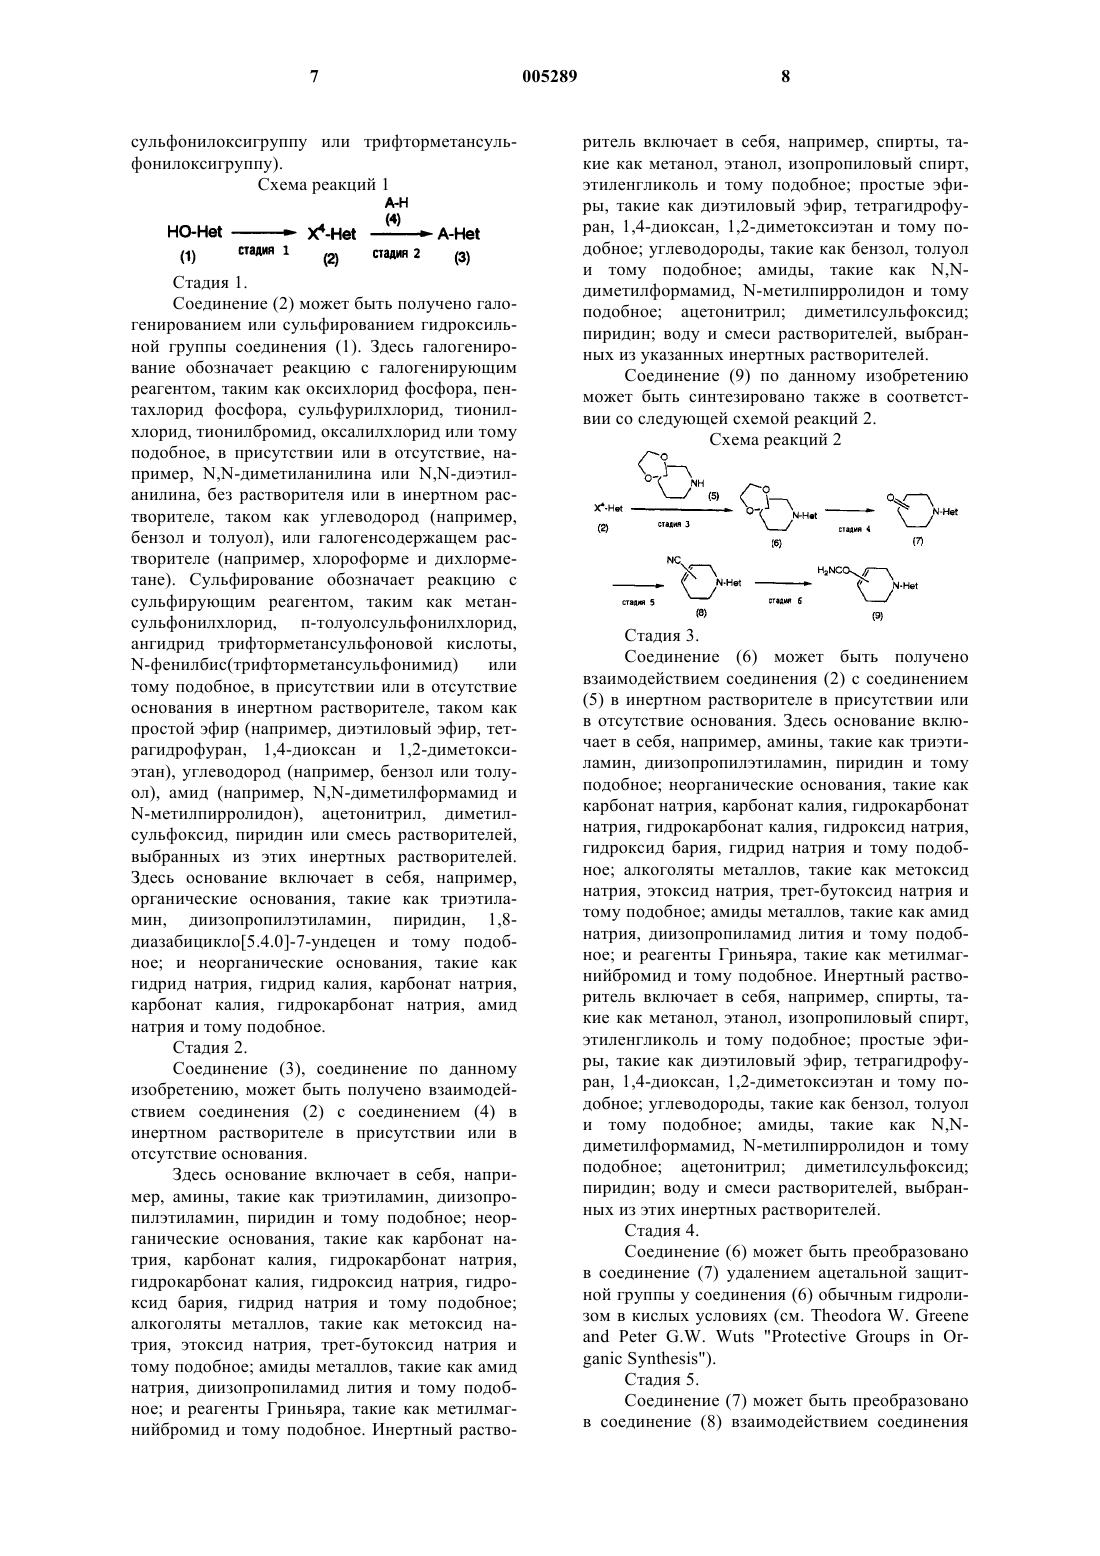 Кортикотропин